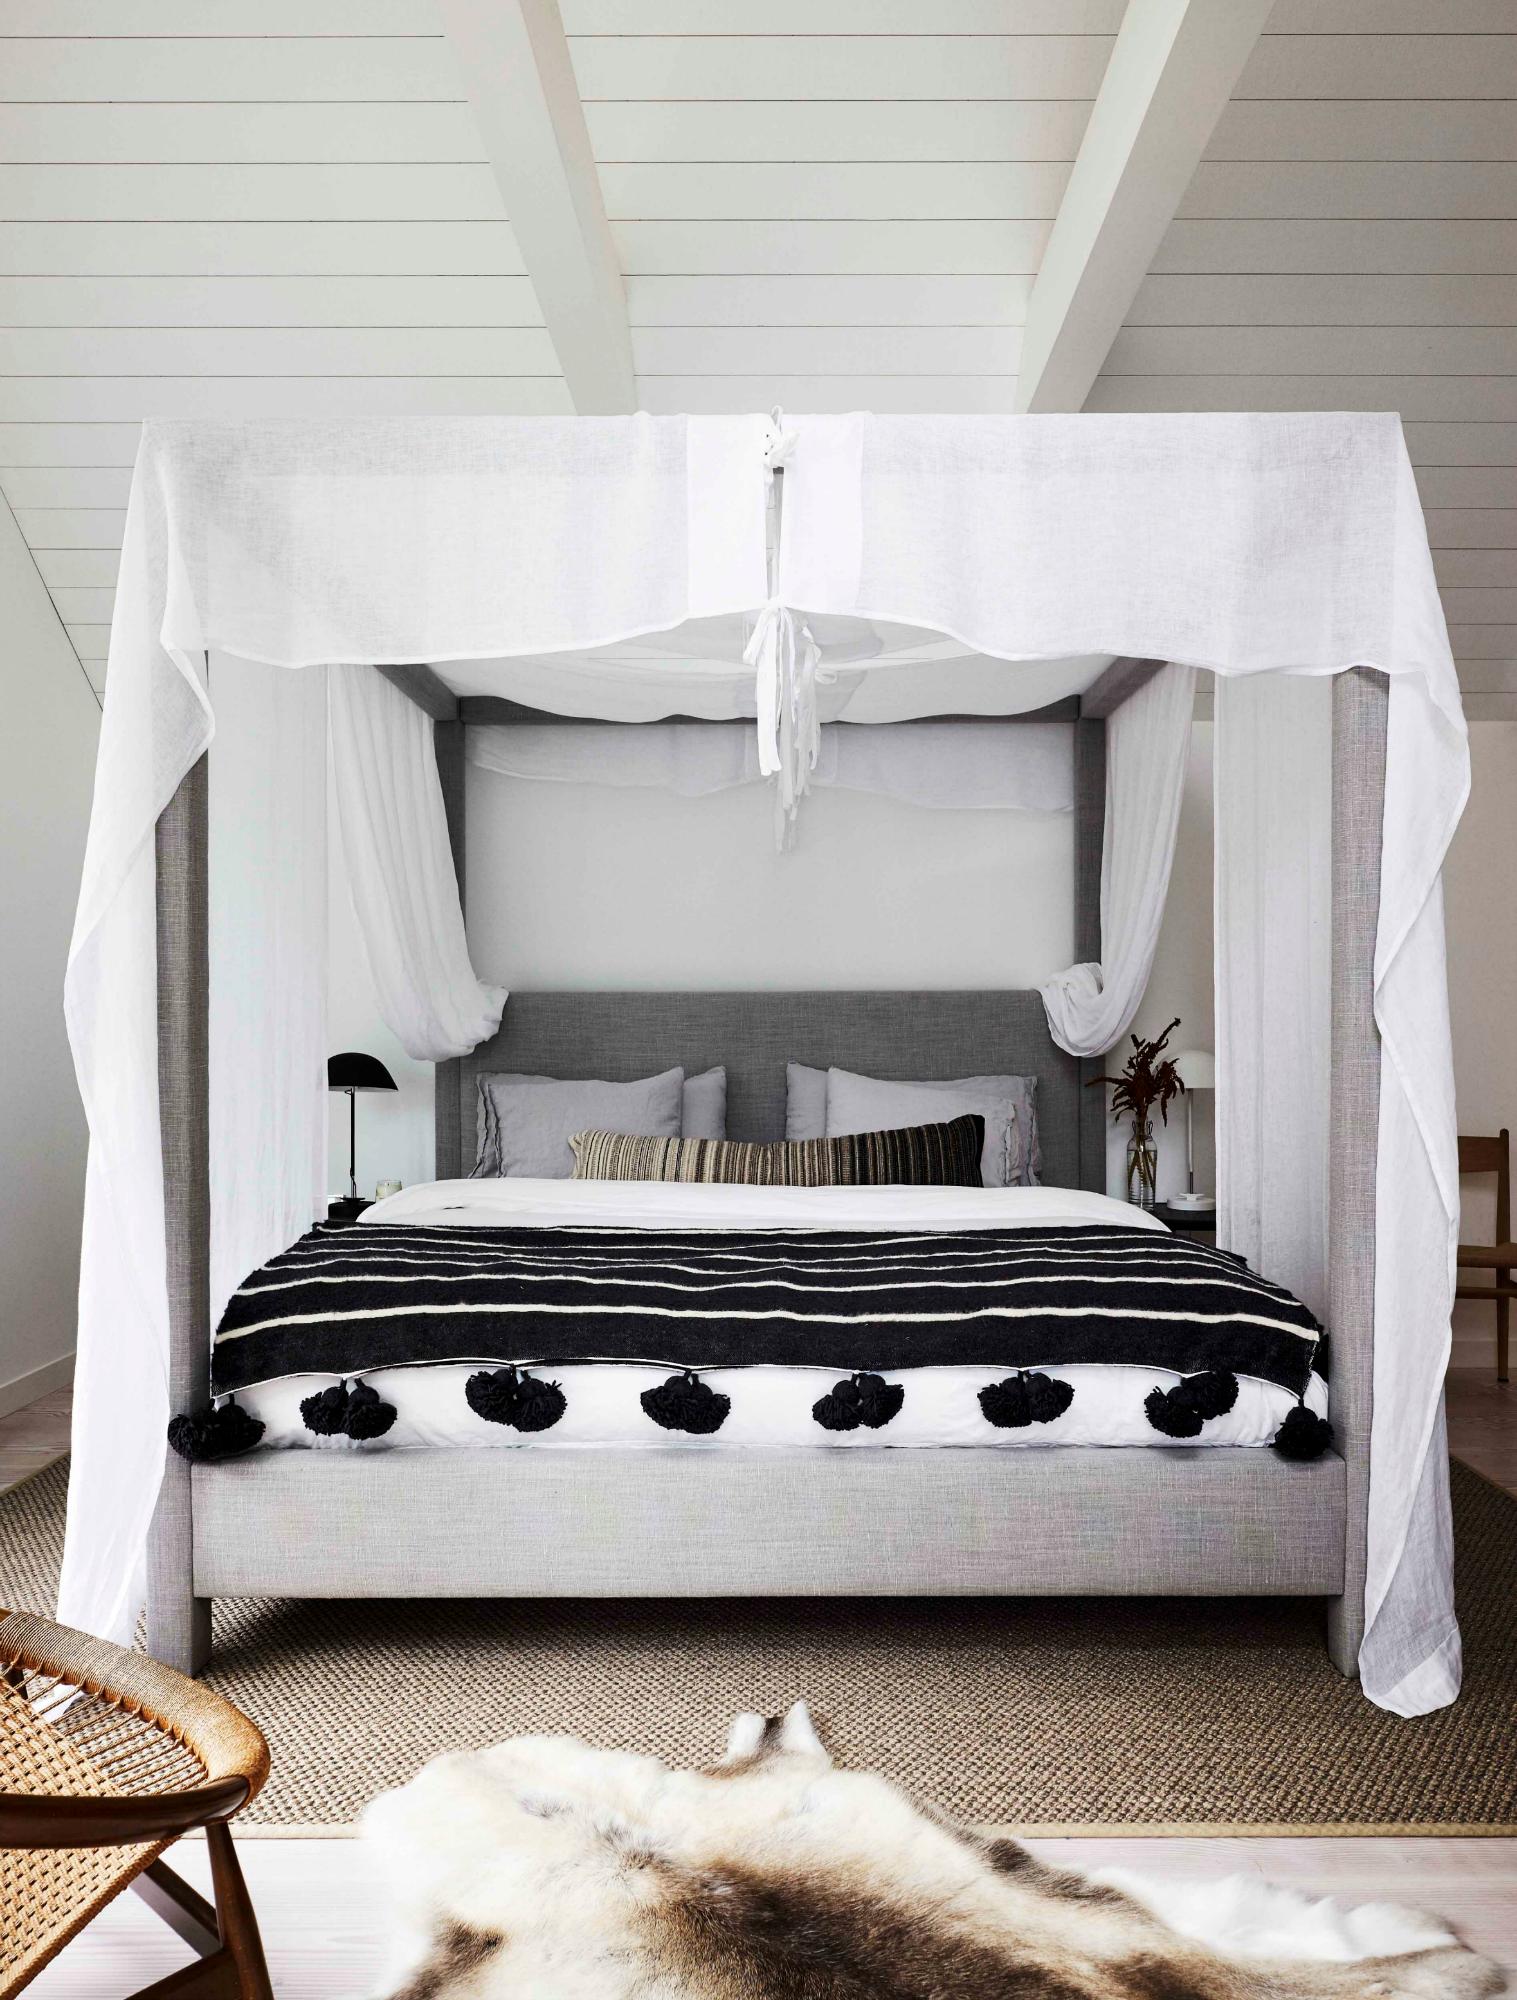 Sängkläder Idéer